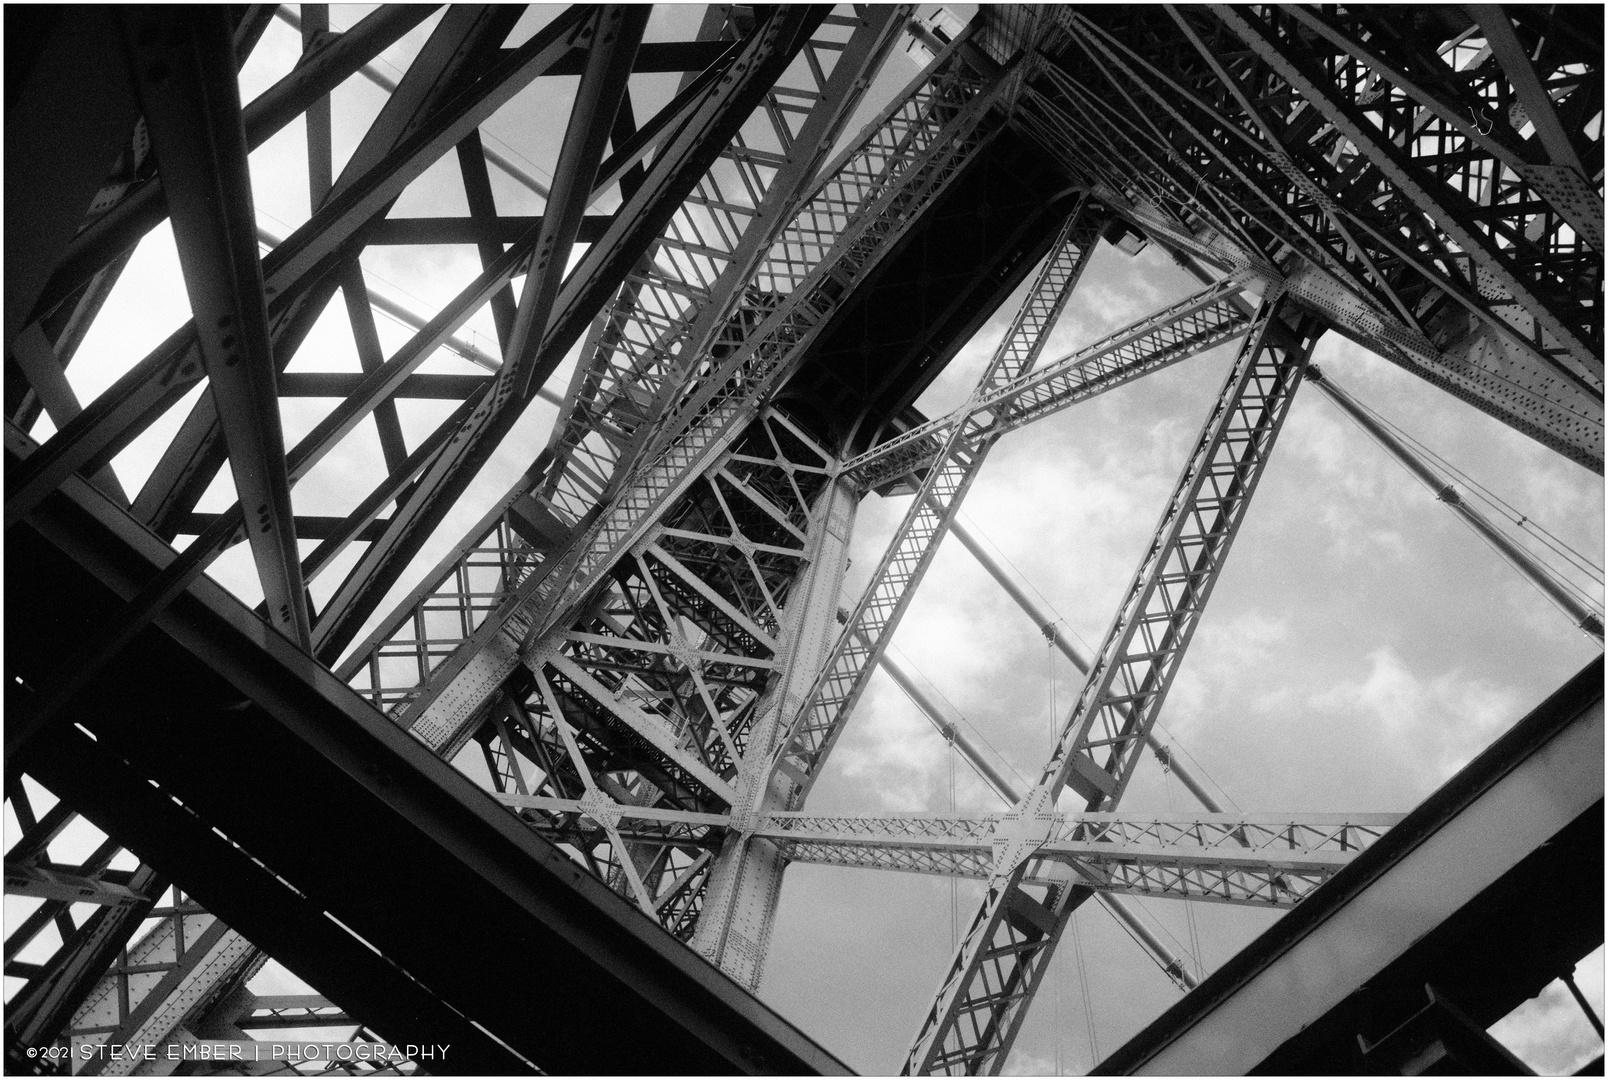 Bridge Beams and Summer Sky - A Williamsburg Bridge Impression